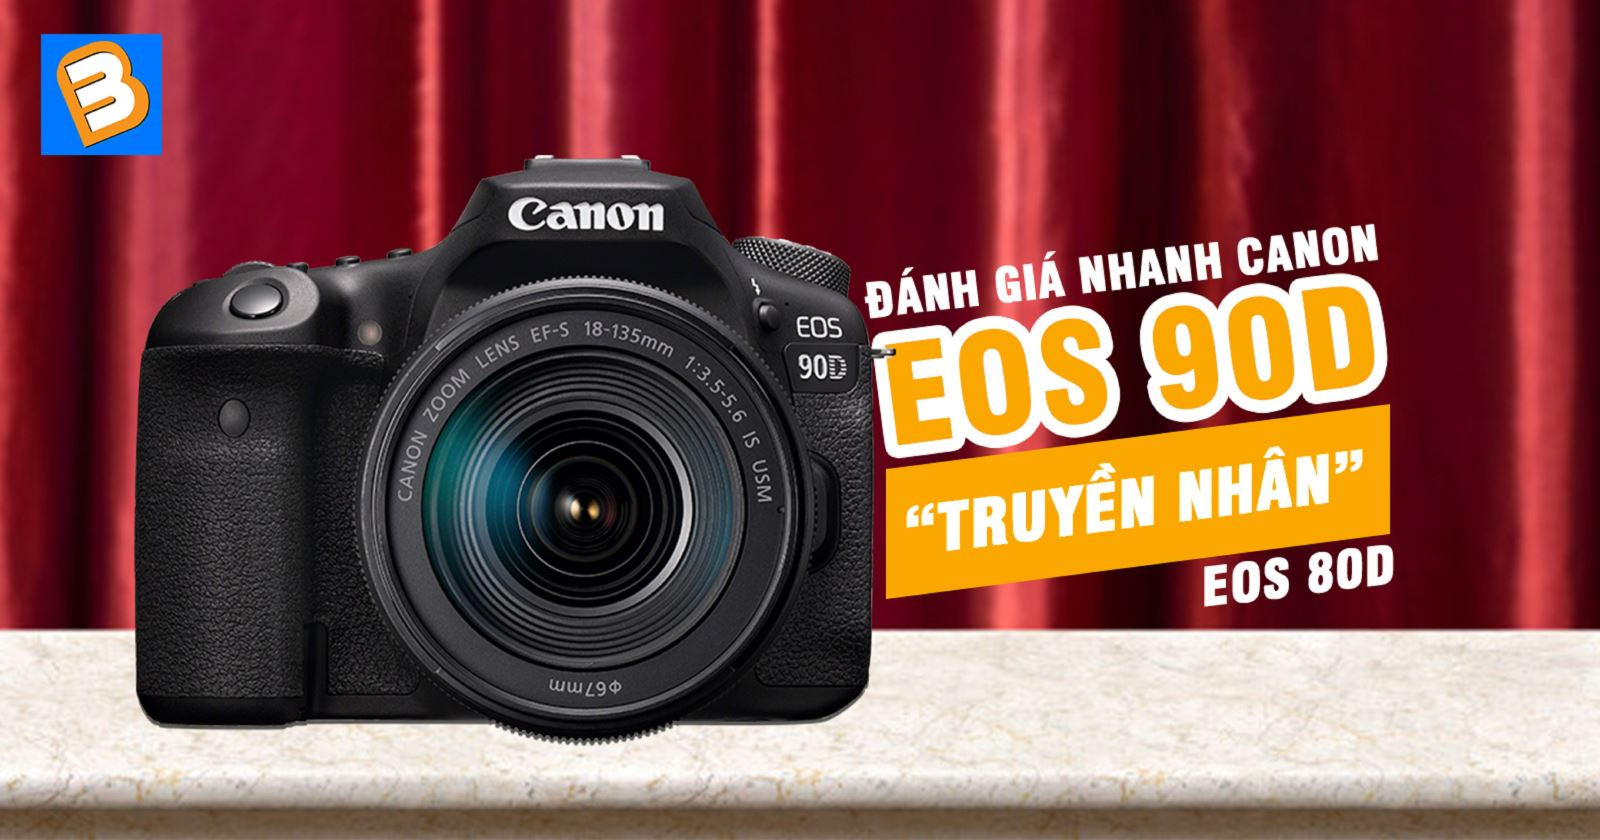 Đánh giánhanh Canon EOS 90D - 'truyền nhân' EOS 80D